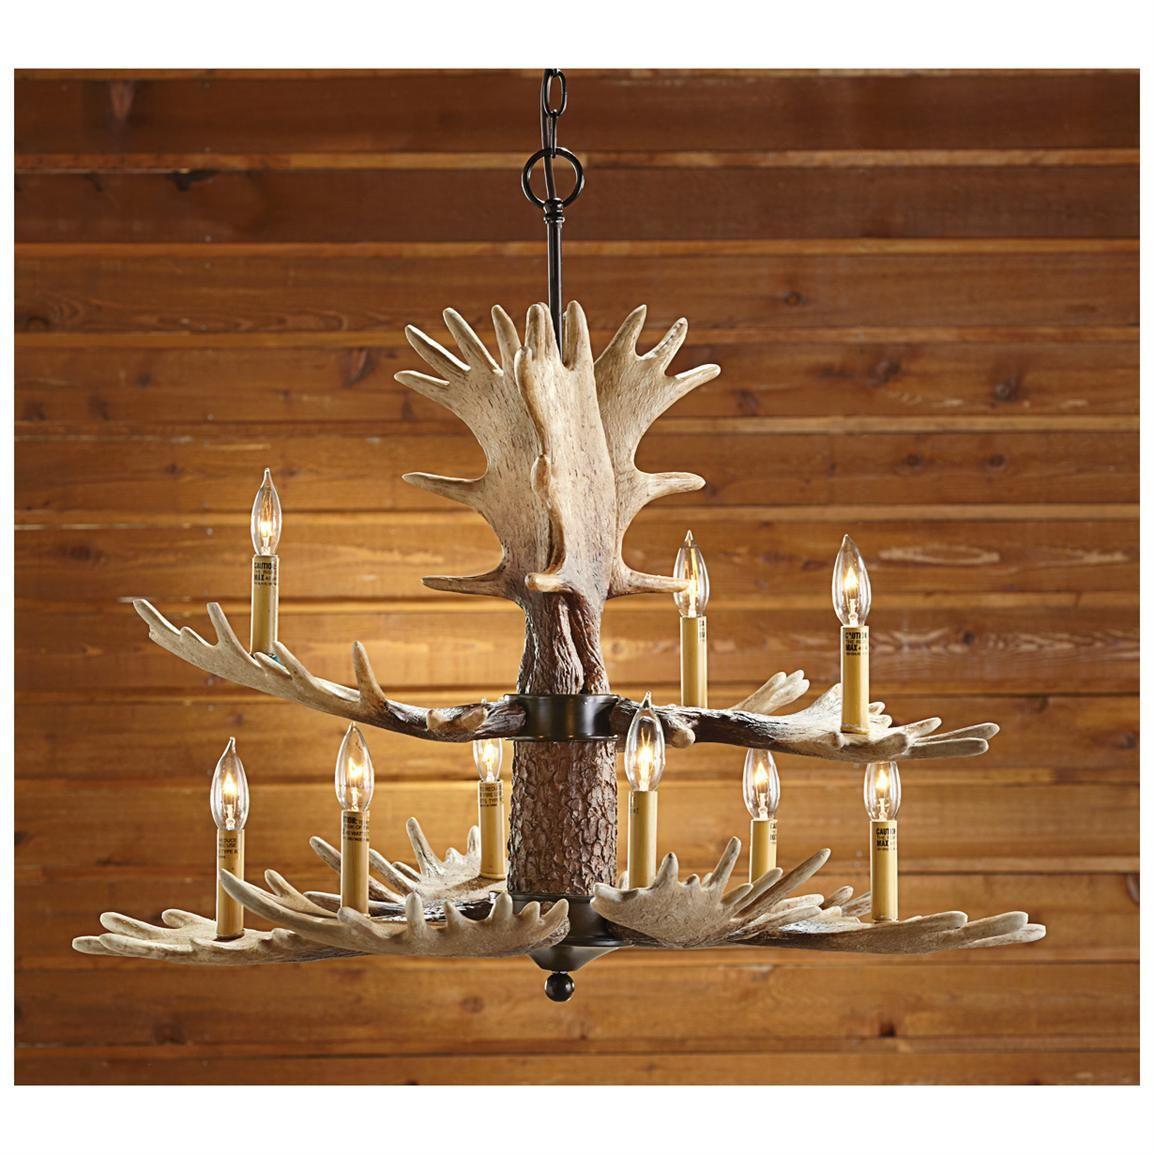 Castlecreek 9 light moose antler chandelier offers rustic hunting castlecreek 9 light moose antler chandelier offers rustic hunting lodge charm aloadofball Image collections